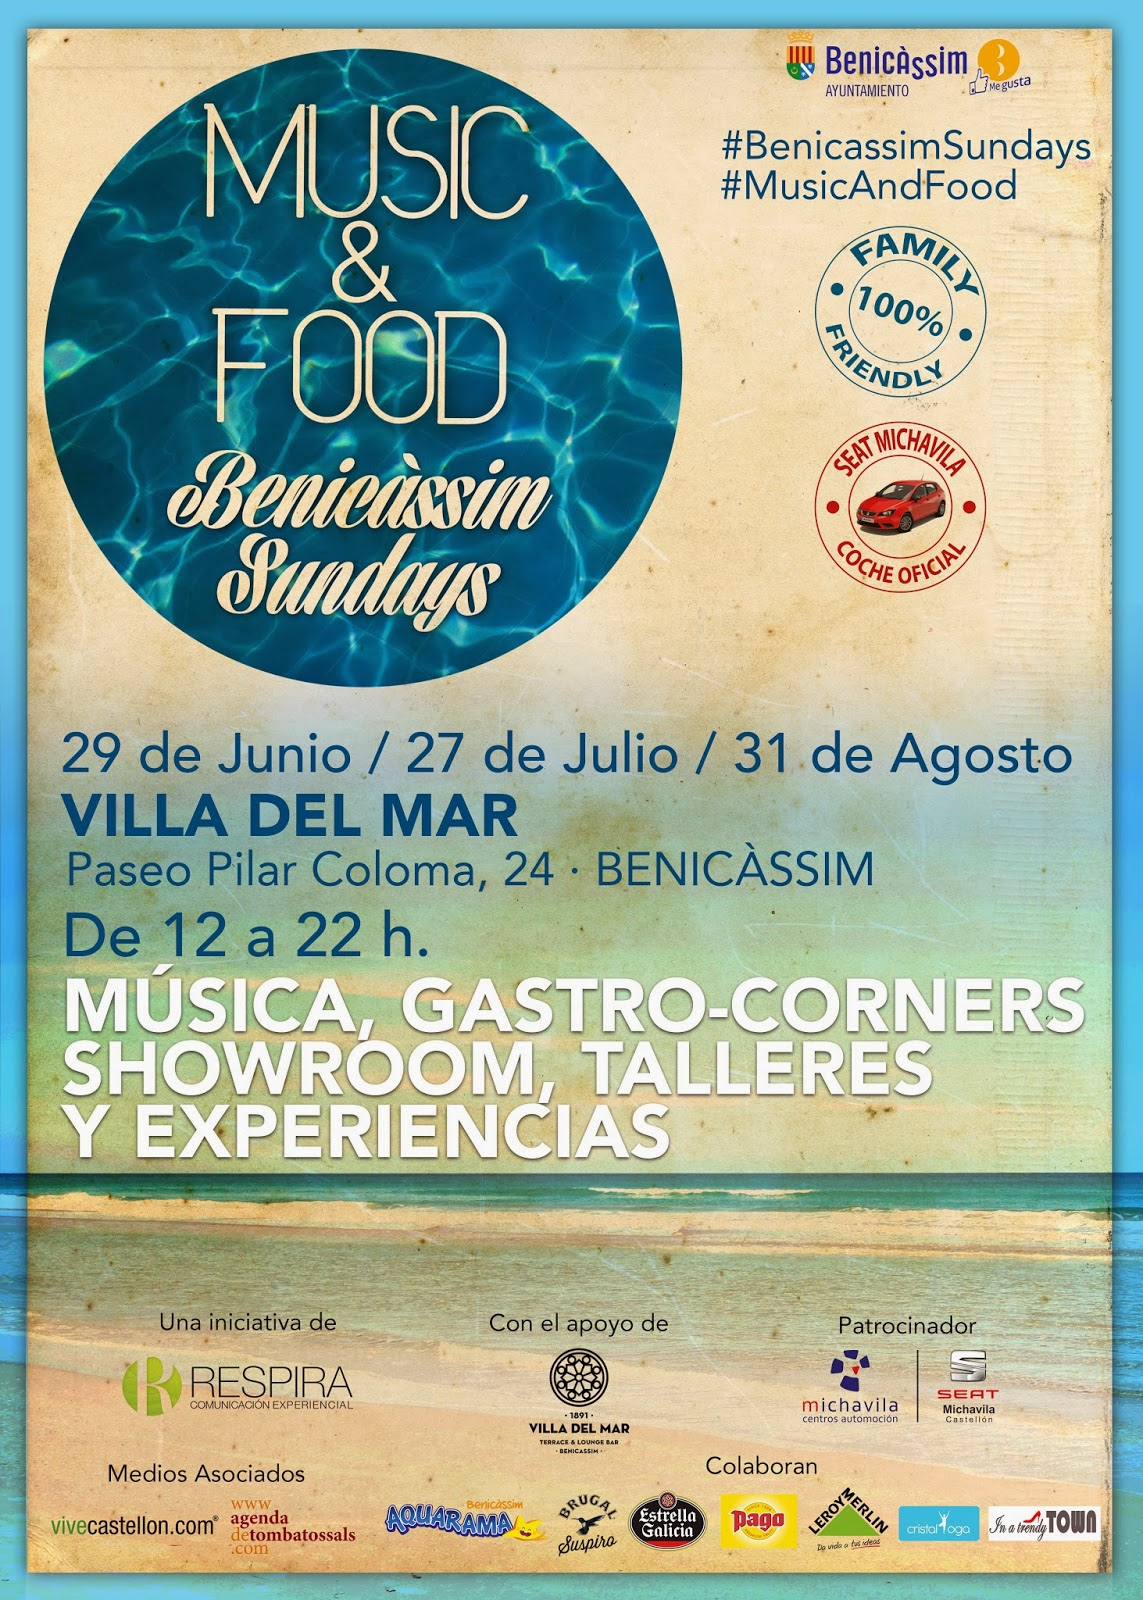 MUSIC & FOOD BENICASSIM